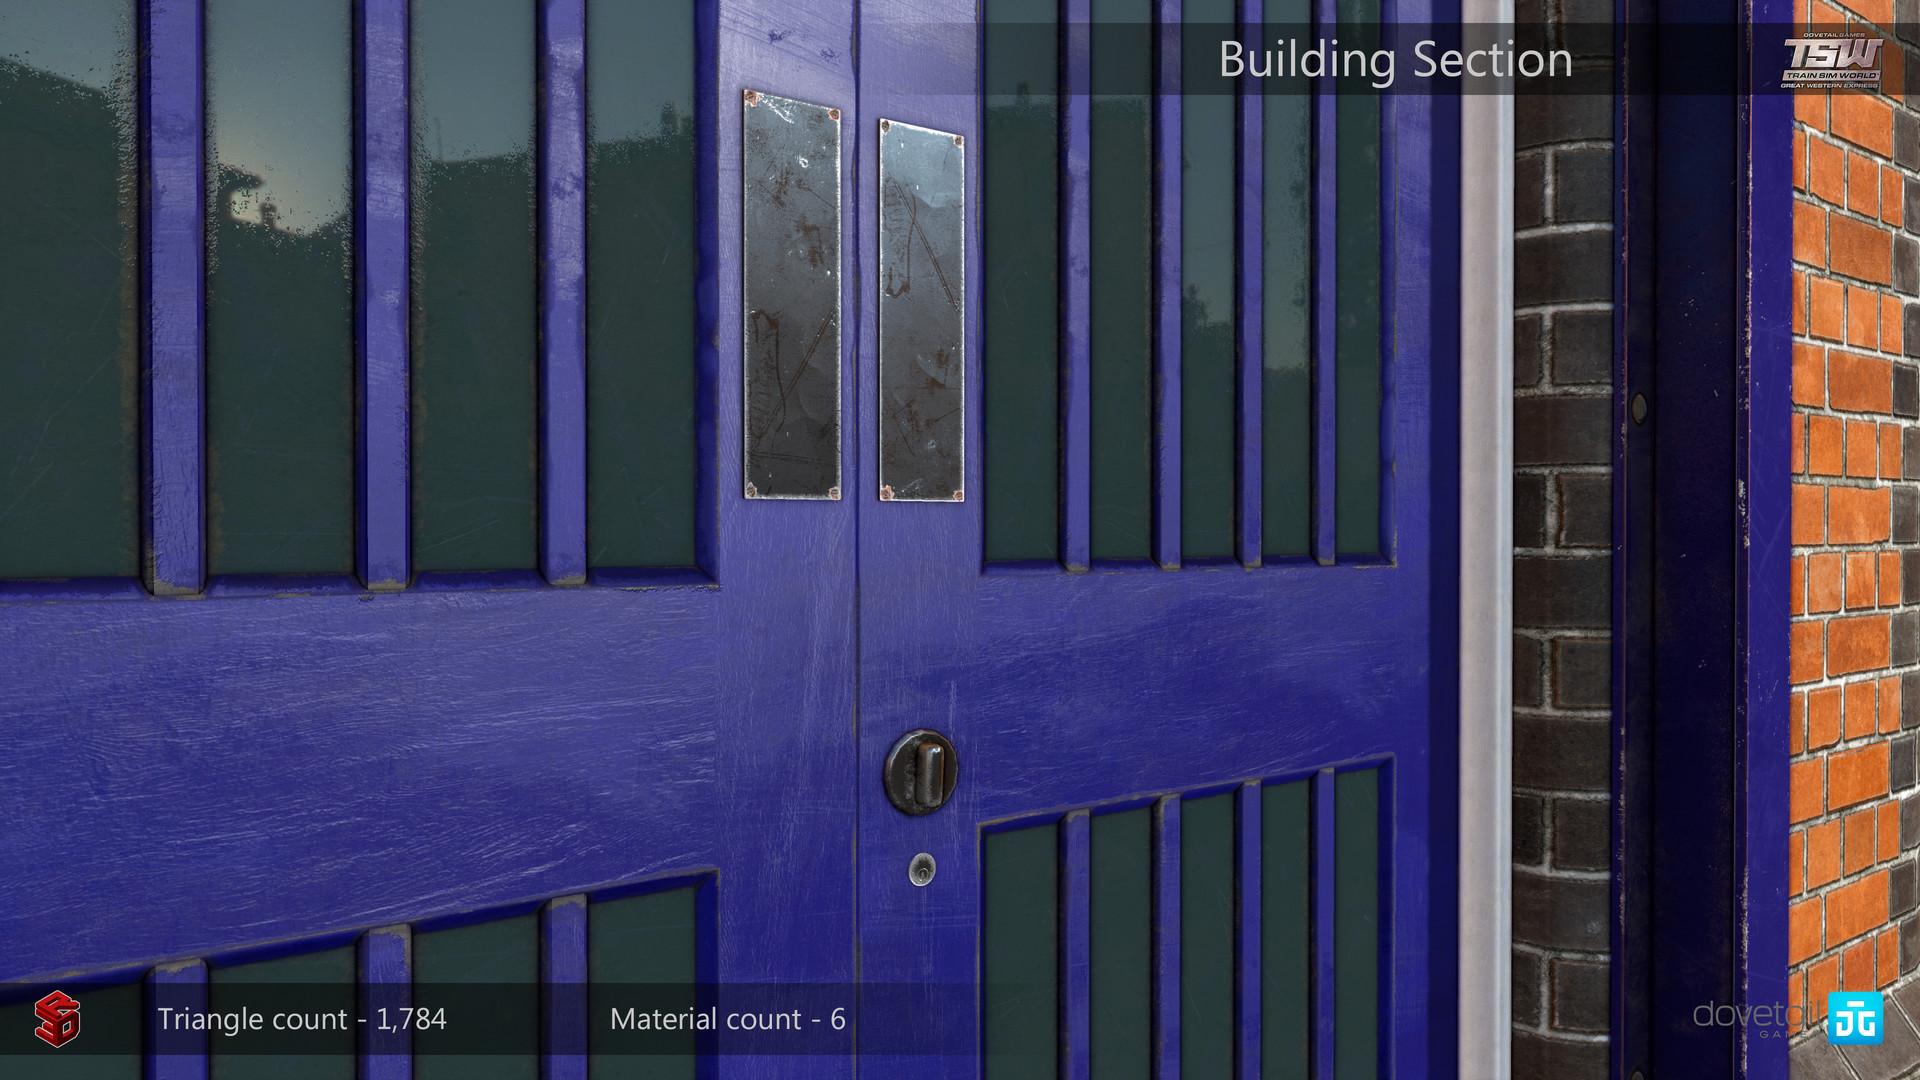 Ross mccafferty buildingsection 07